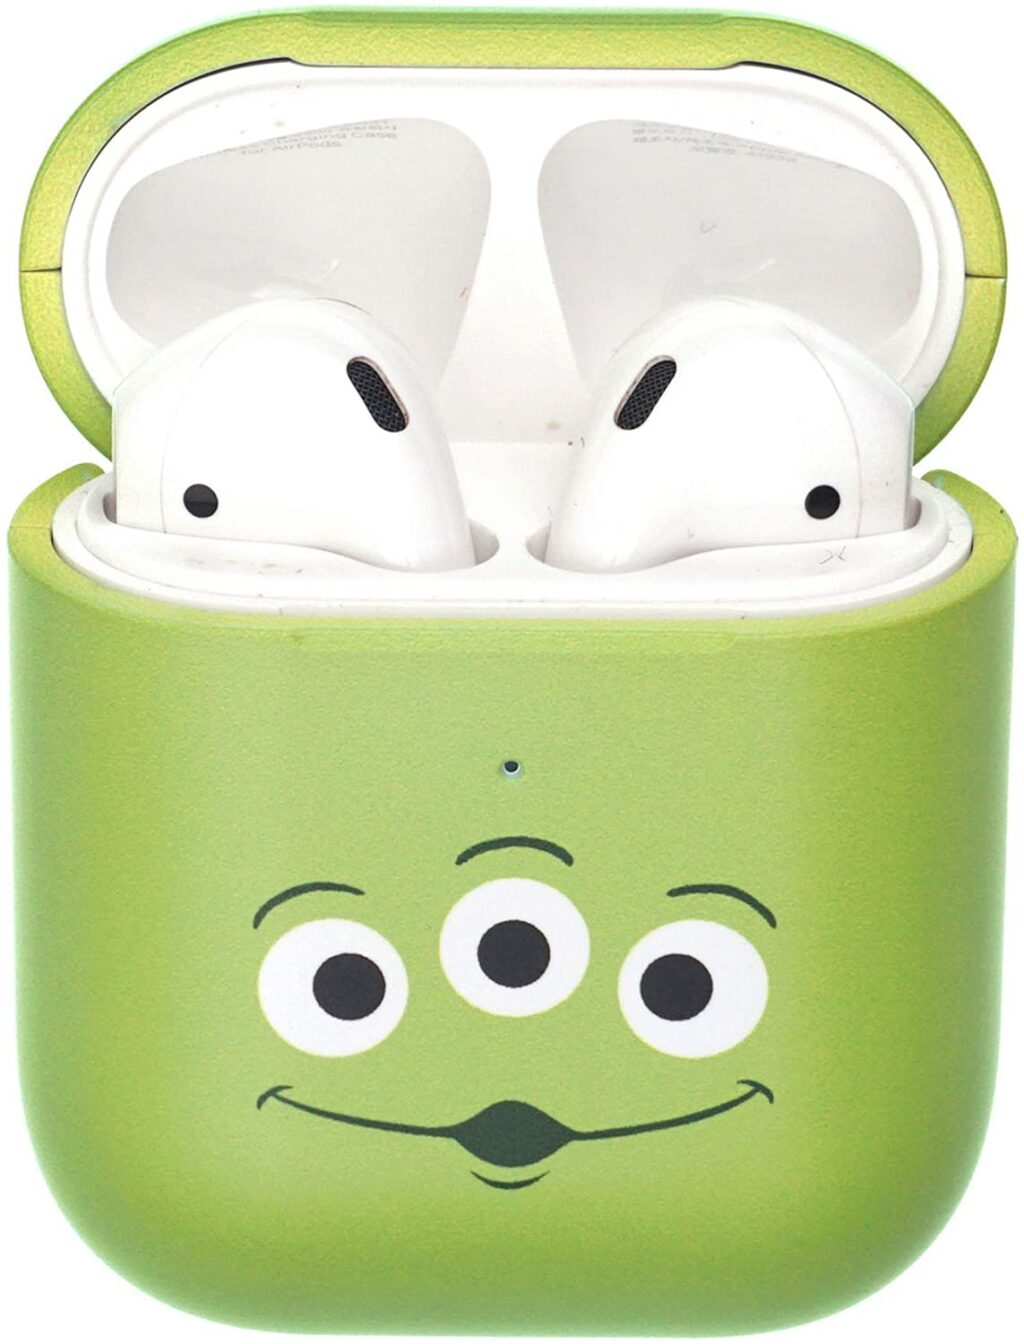 Disney Obsession: Pixar Airpod Cases